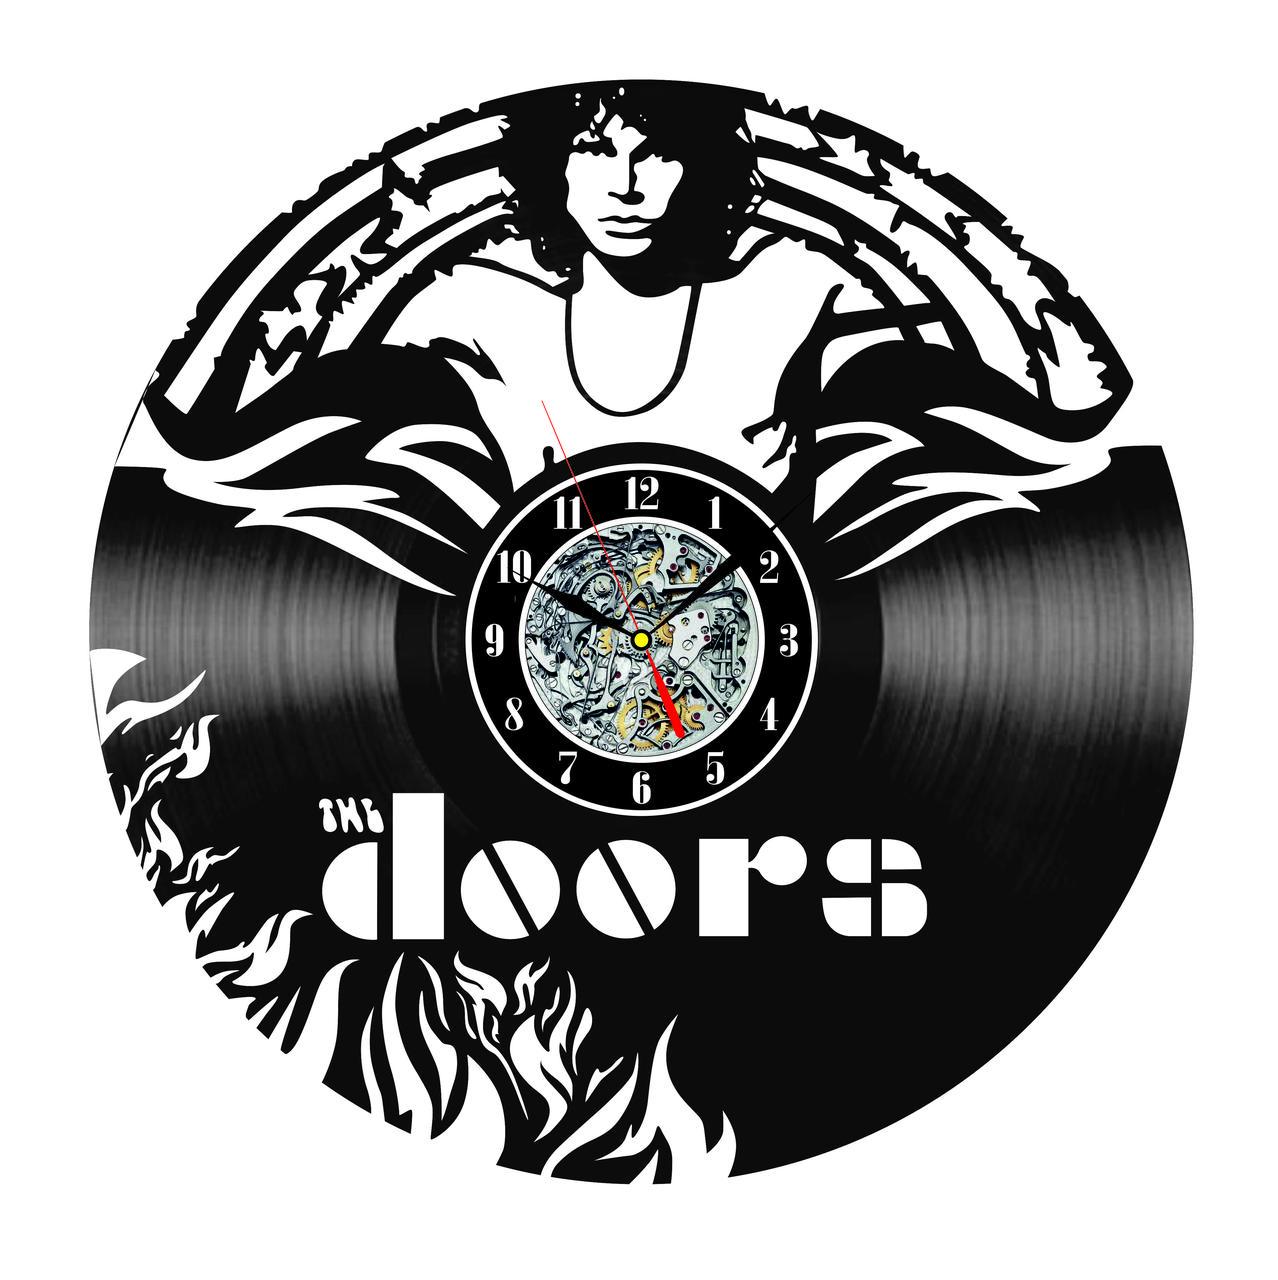 Настенные часы из виниловых пластинок LikeMark The Doors